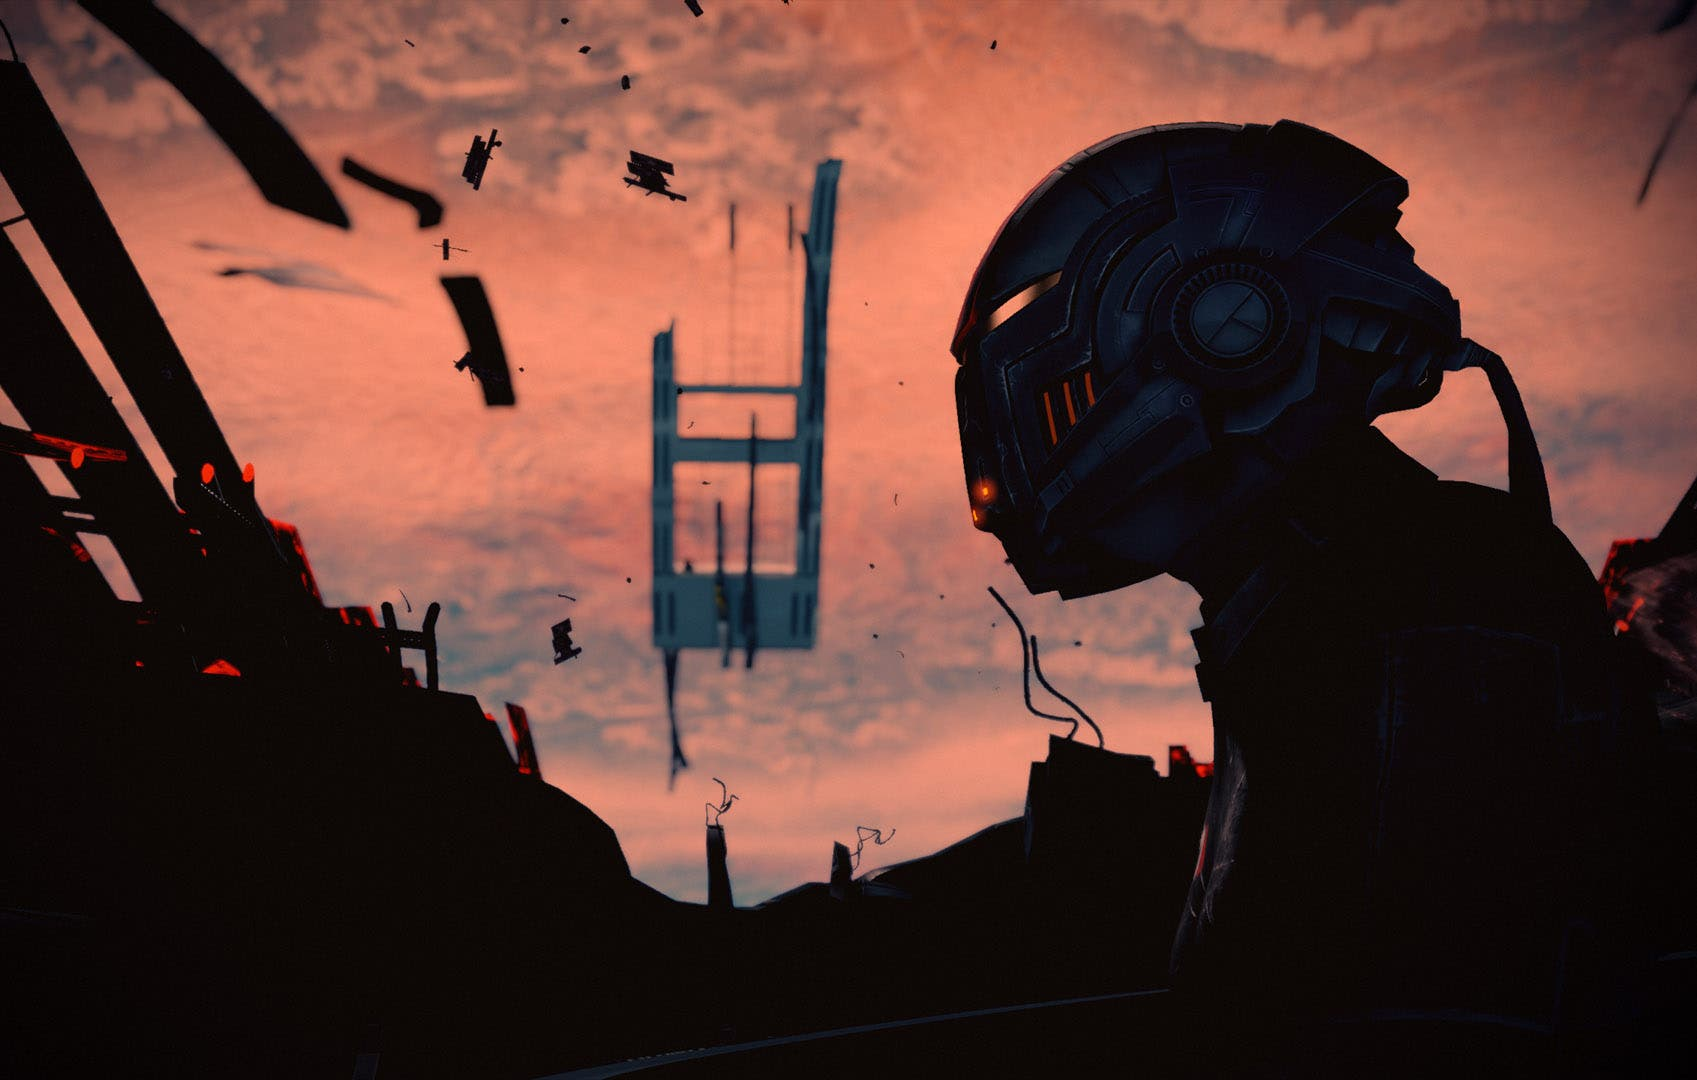 En qué orden jugar los DLCs de Mass Effect 2 en Mass Effect: Legendary Edition 6